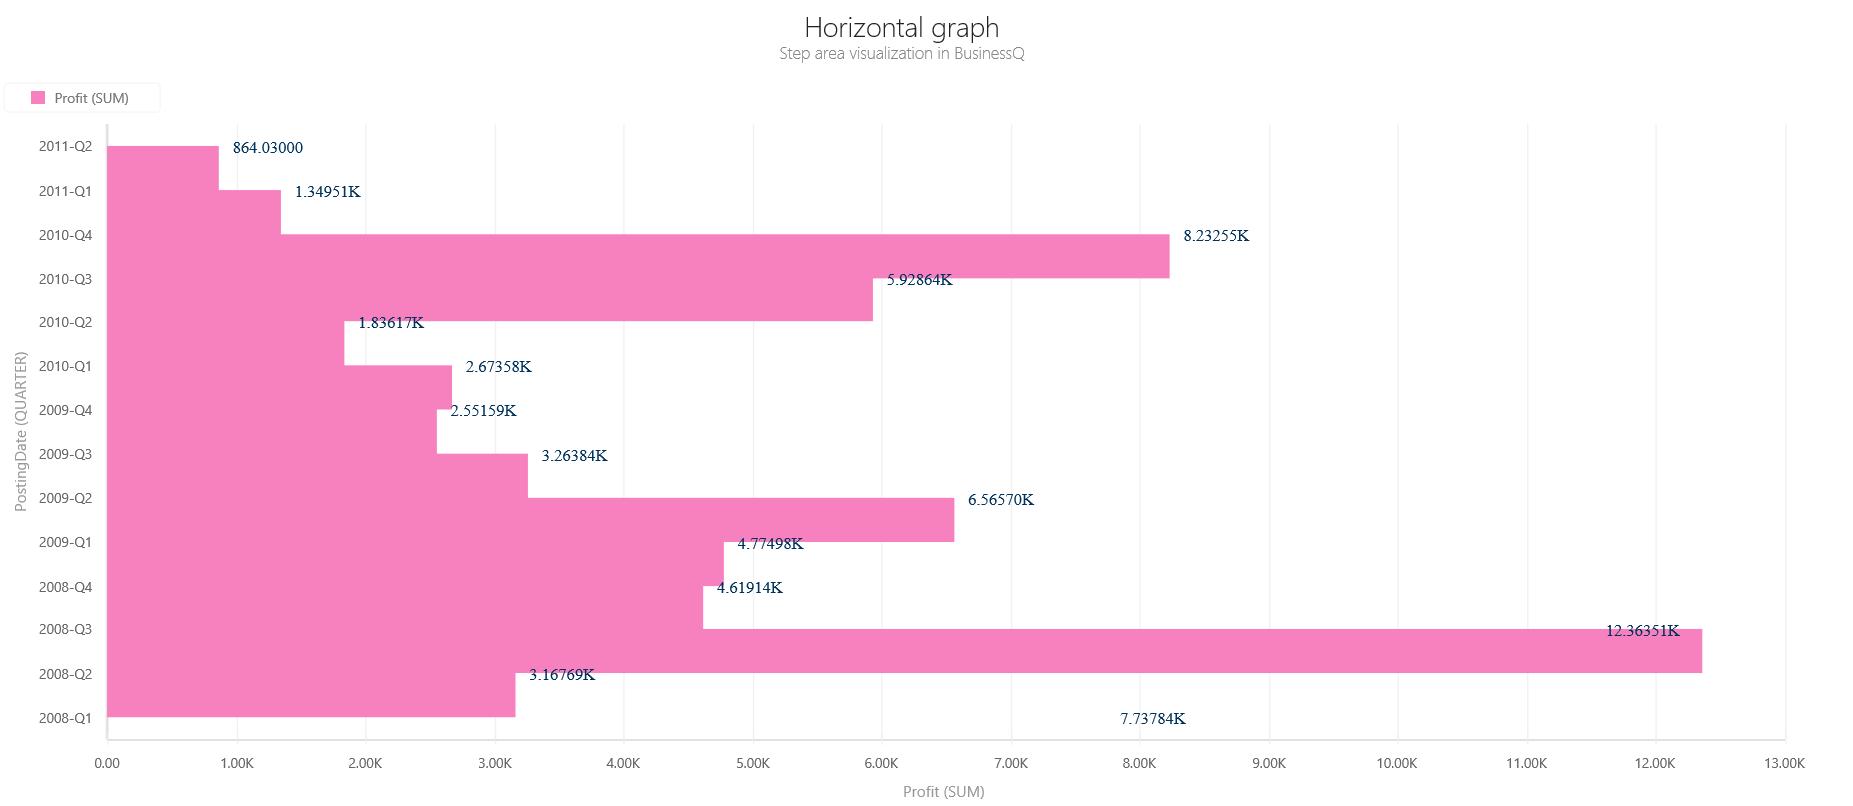 BQ_Horizontal_graph_1_Horizontal_Step_Area